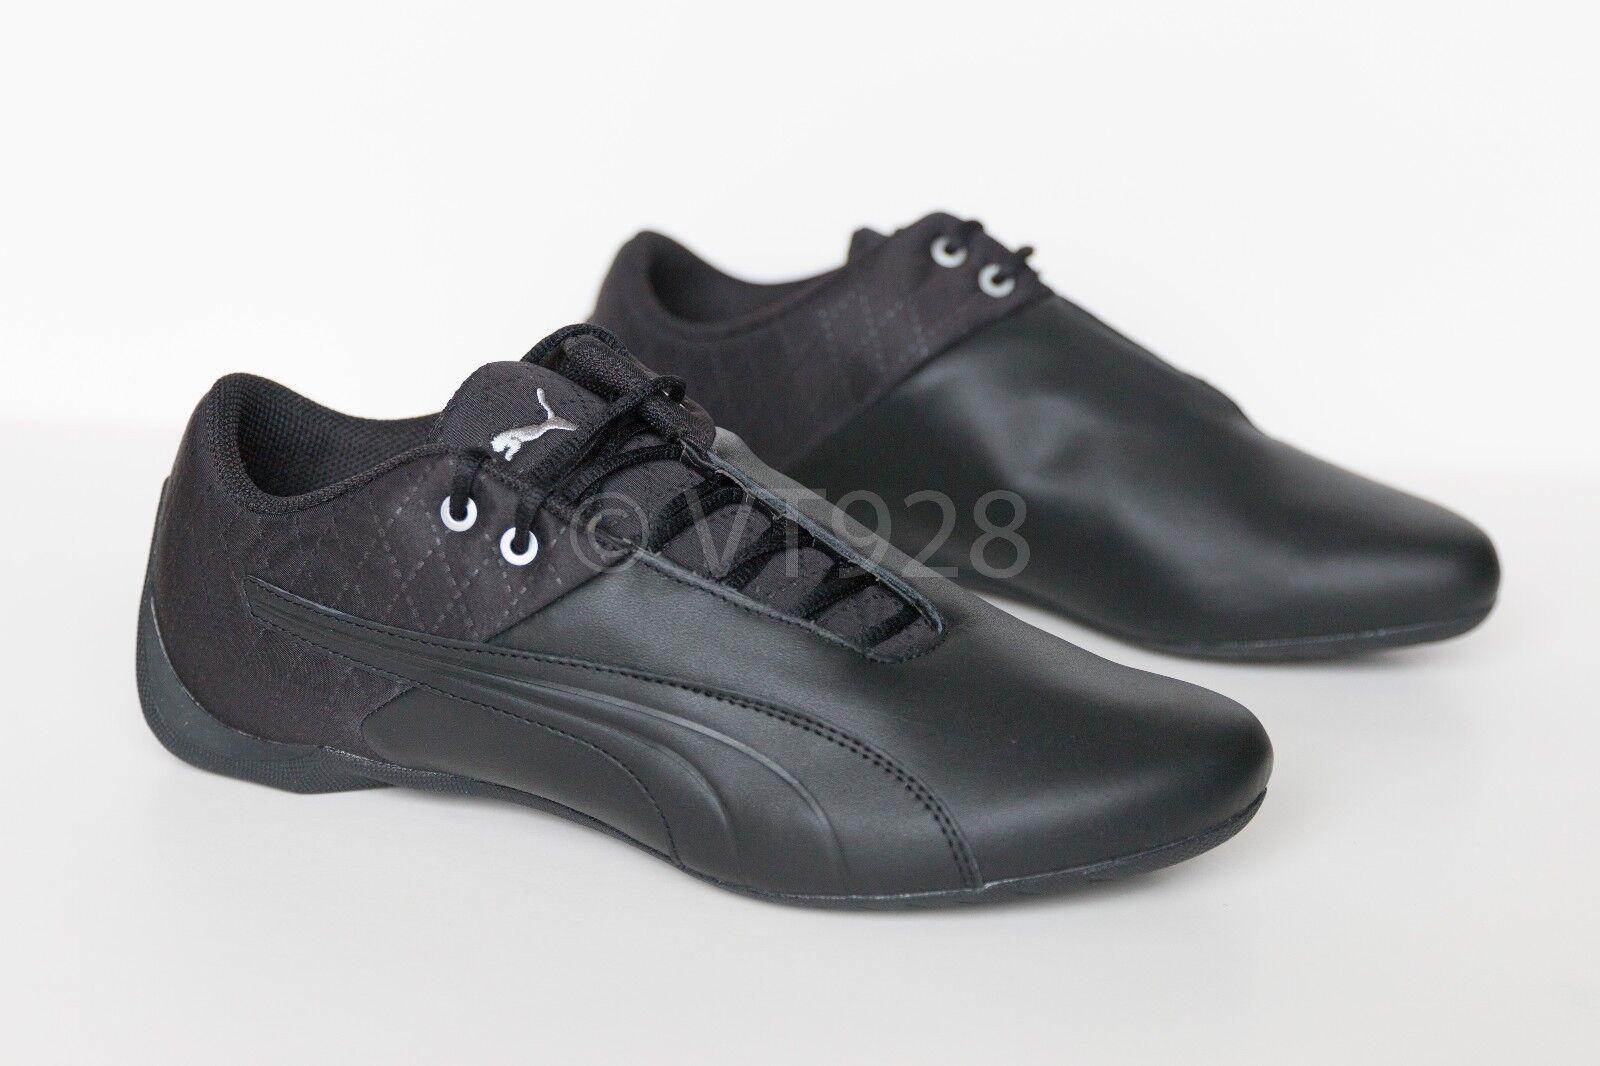 NEW PUMA FUTURE CAT REENG QUILTED uomo scarpe nero nero nero ALL DimensioneS 9959b0